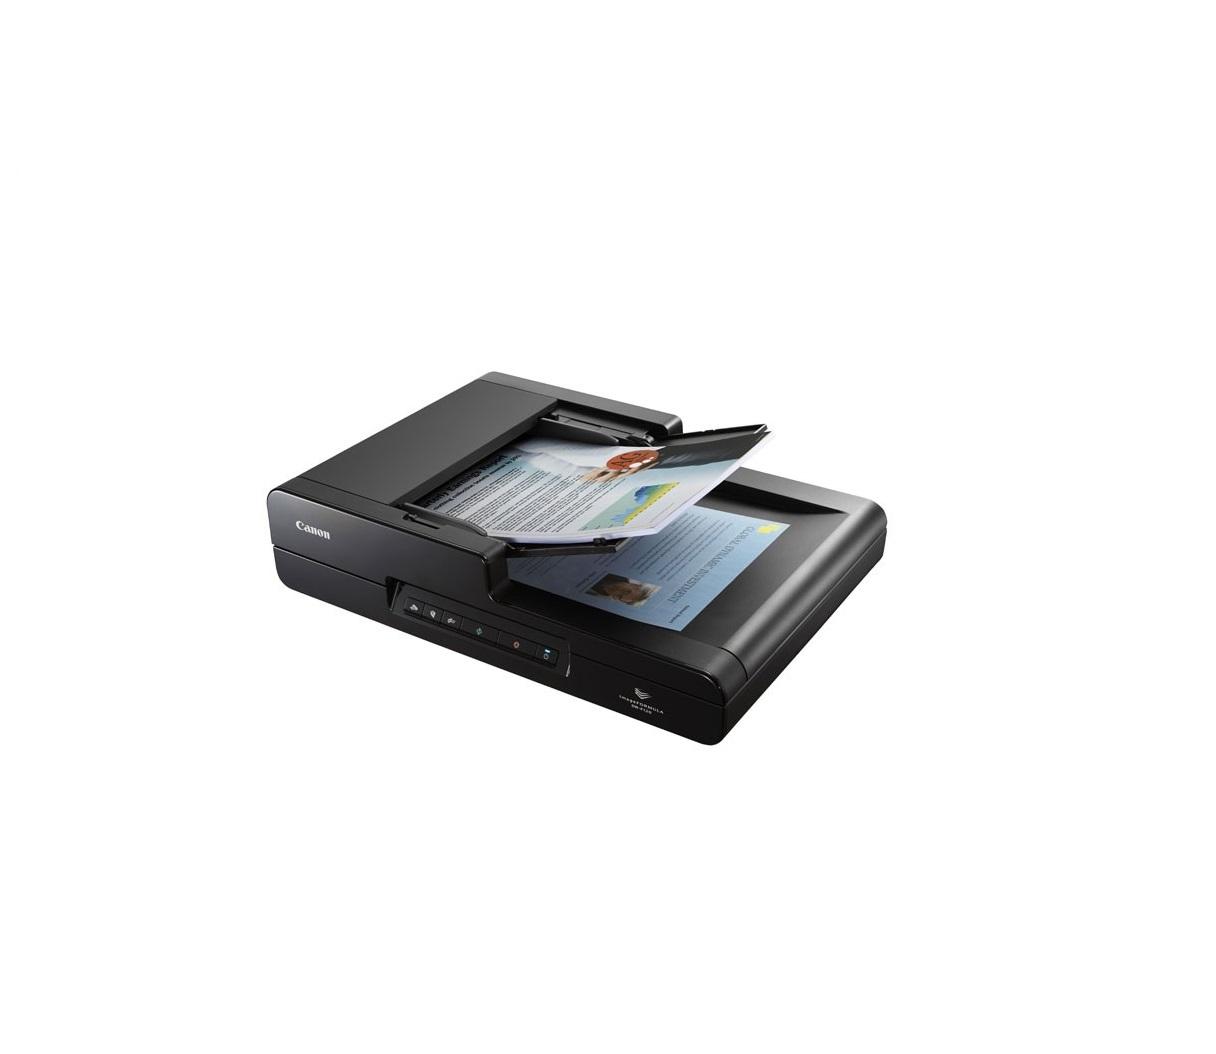 Canon Image Formula DR-F120 600dpi 24bit Color Duplex USB 2.0 Document Scanner 9017B002